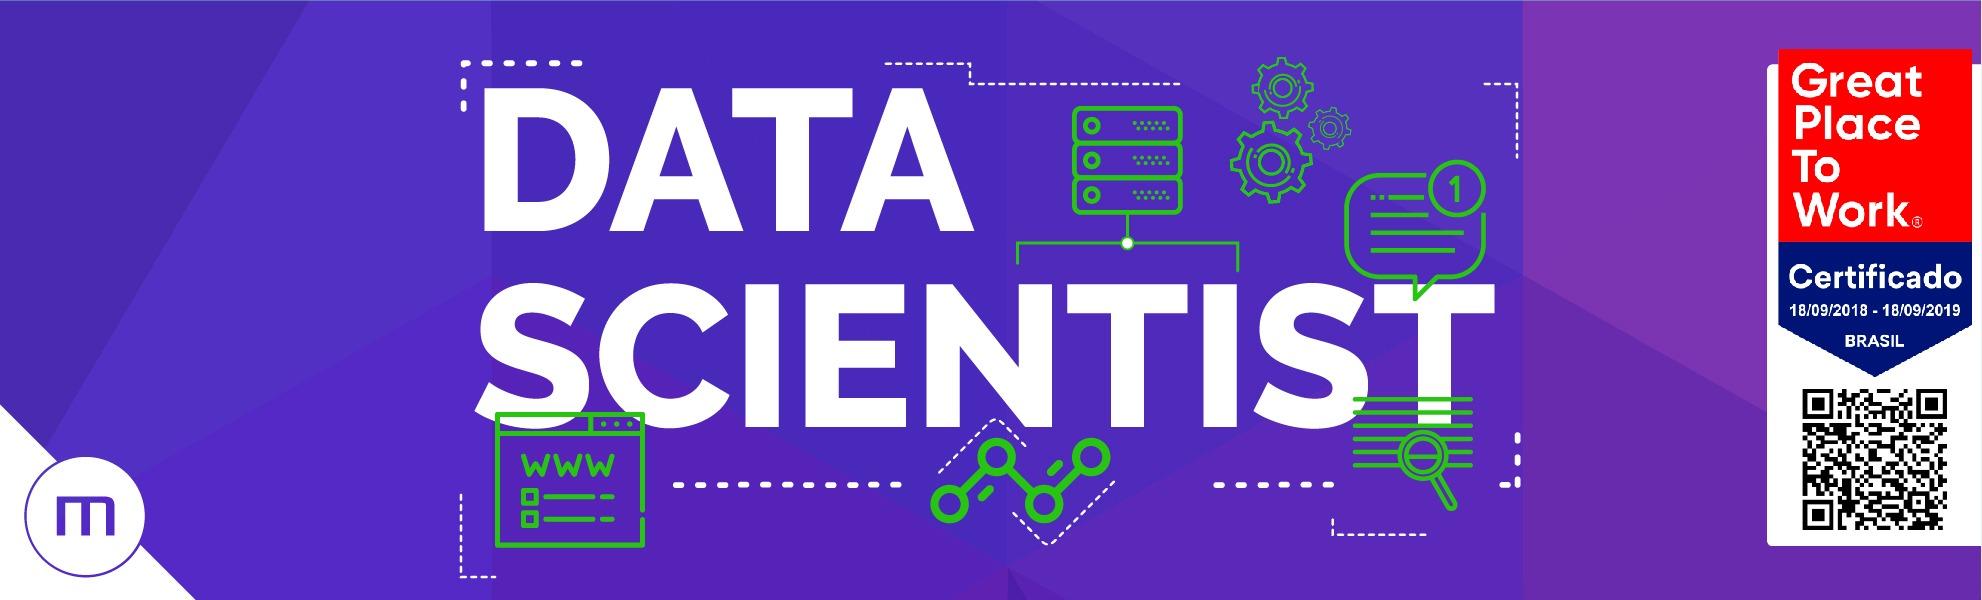 AI/Data Scientist